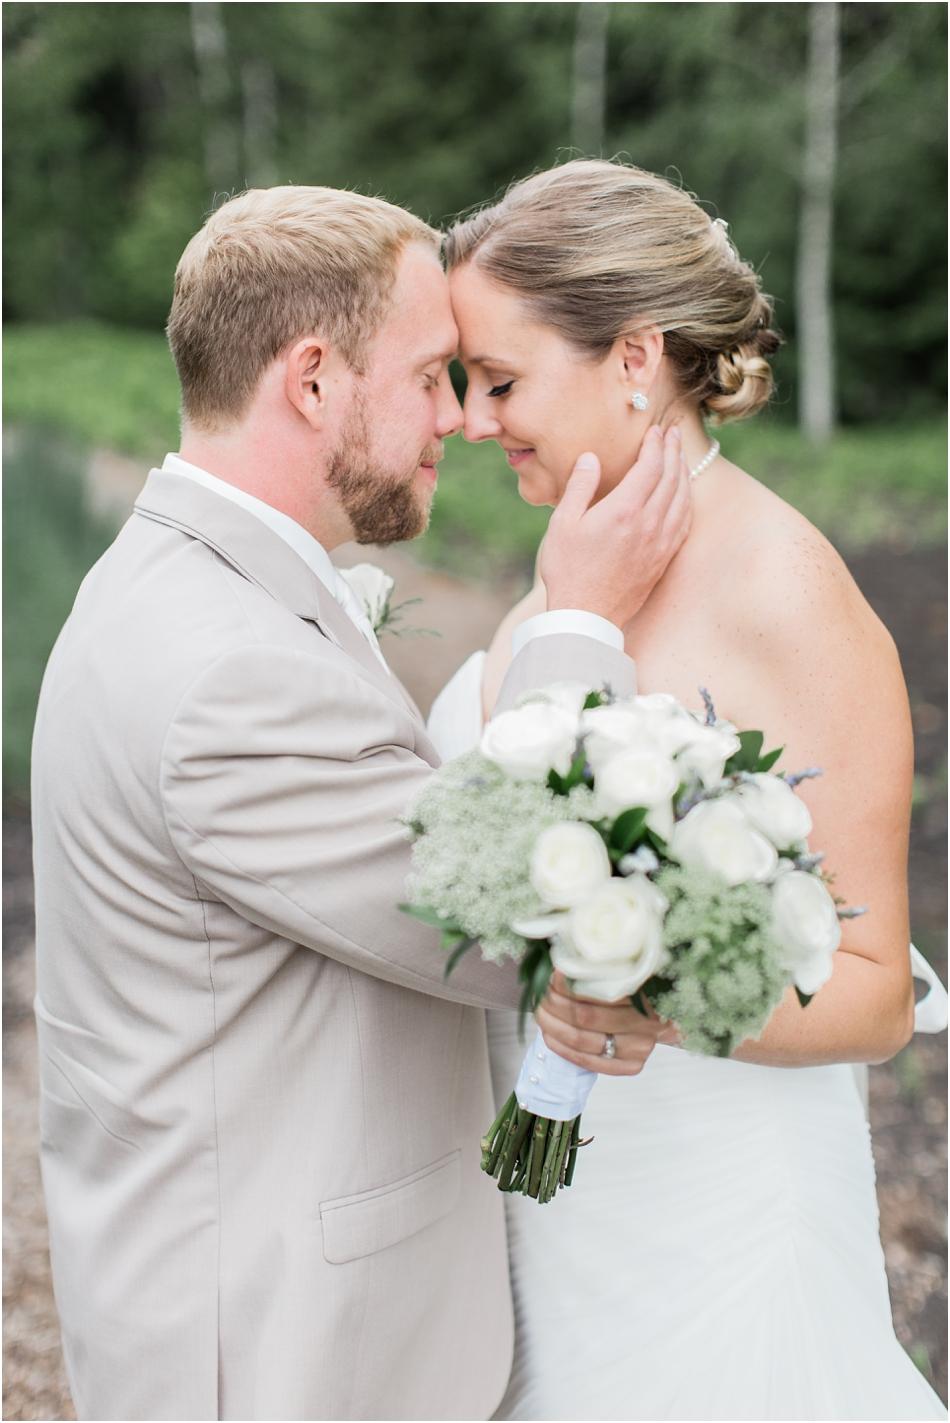 alnoba_marie_kevin_new_hampshire_boston_massachusetts_cape_cod_new_england_wedding_photographer_Meredith_Jane_Photography_photo_1981.jpg